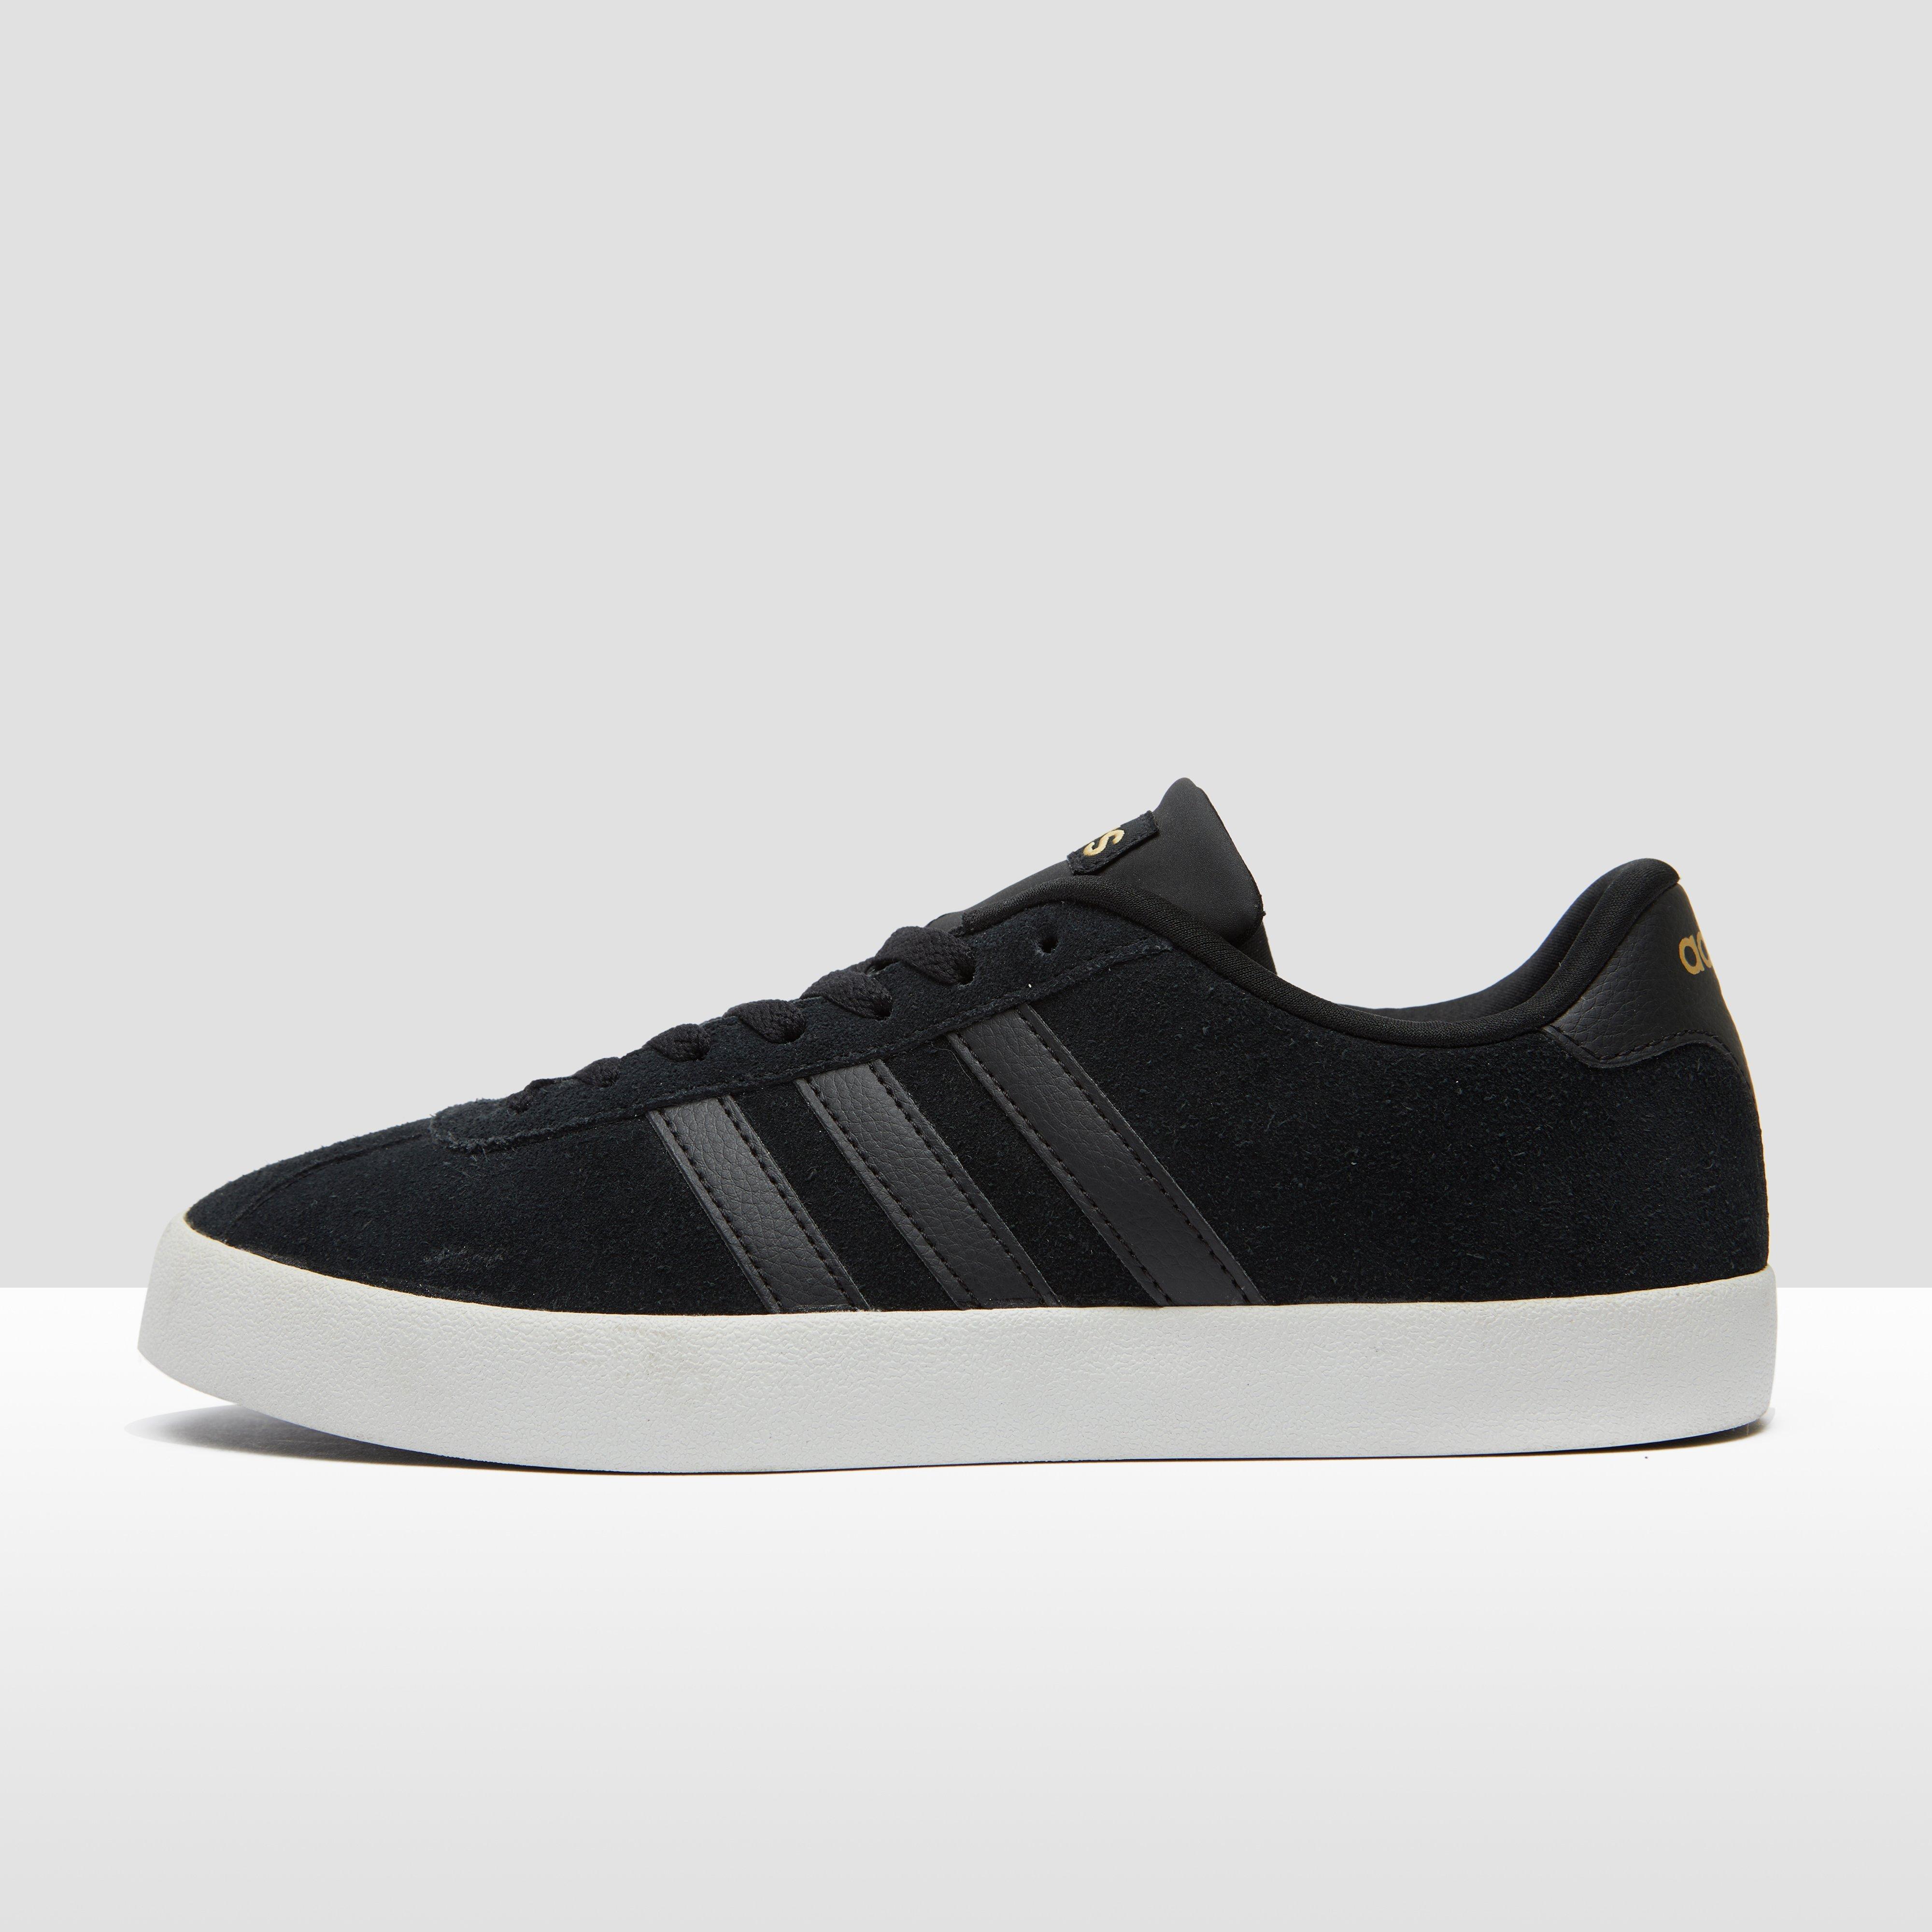 Adidas - Court Vulc Sneakers - Hommes - Chaussures De Sport - Noir - 42 2/3 Ls9OKqXSLJ